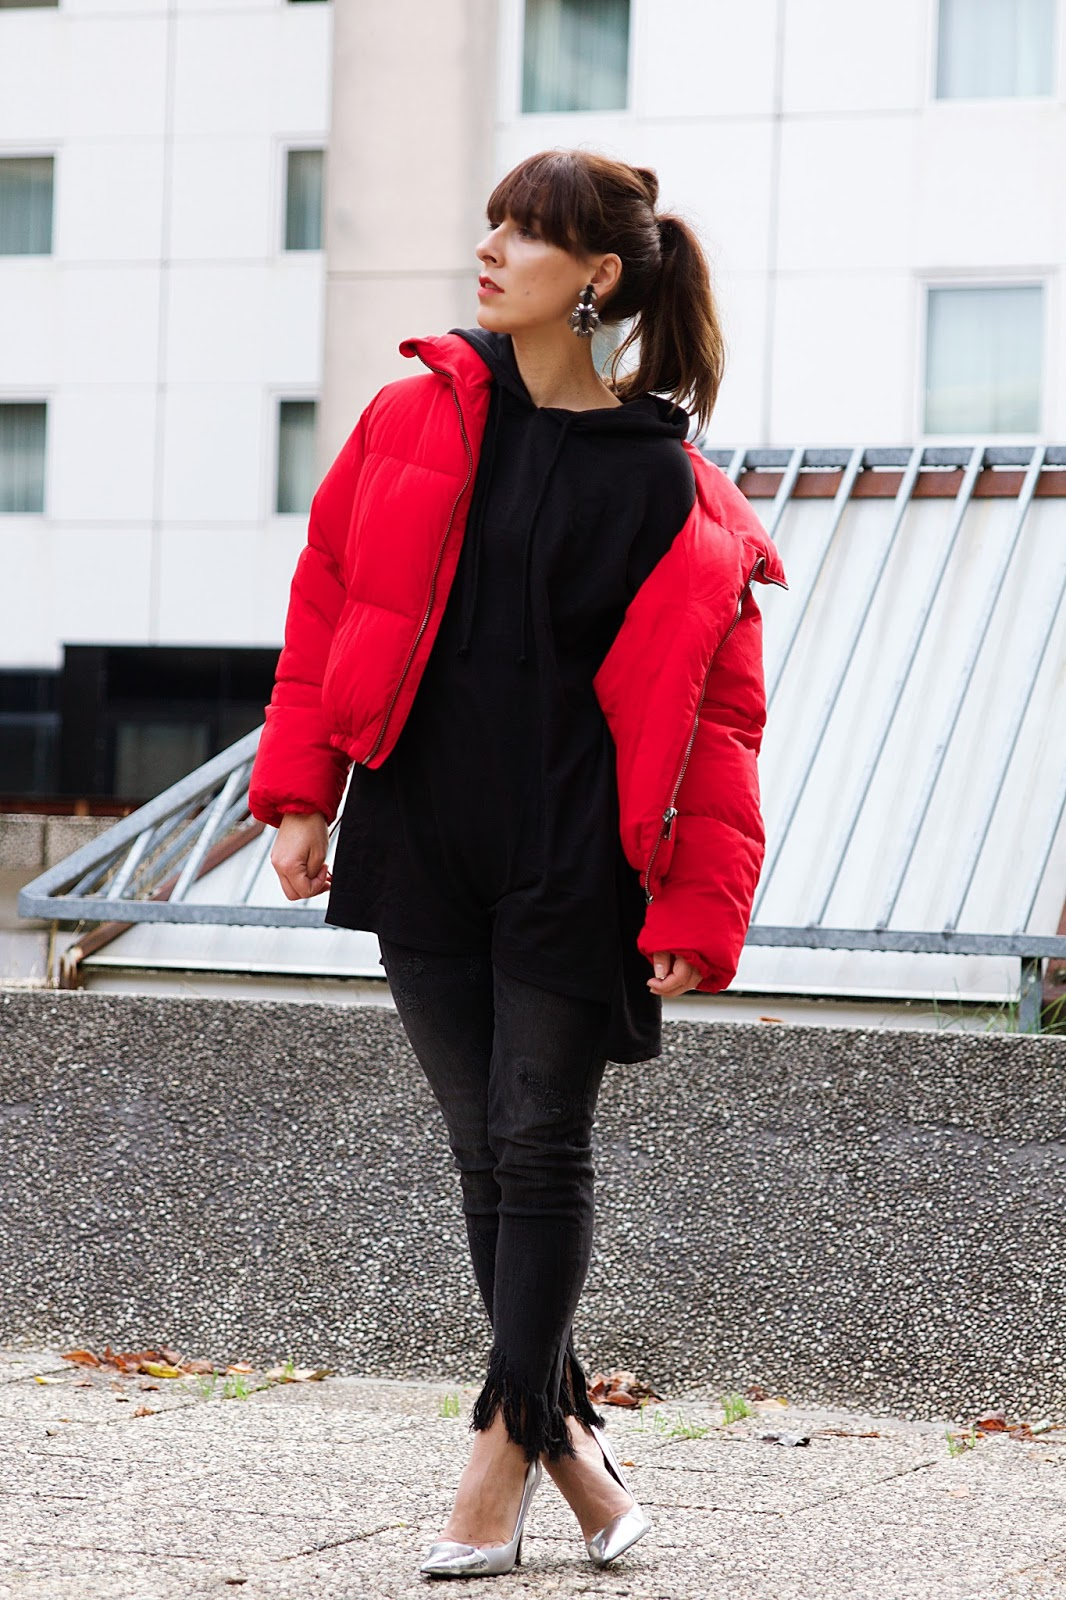 doudoune rouge Bershka , manteau hiver